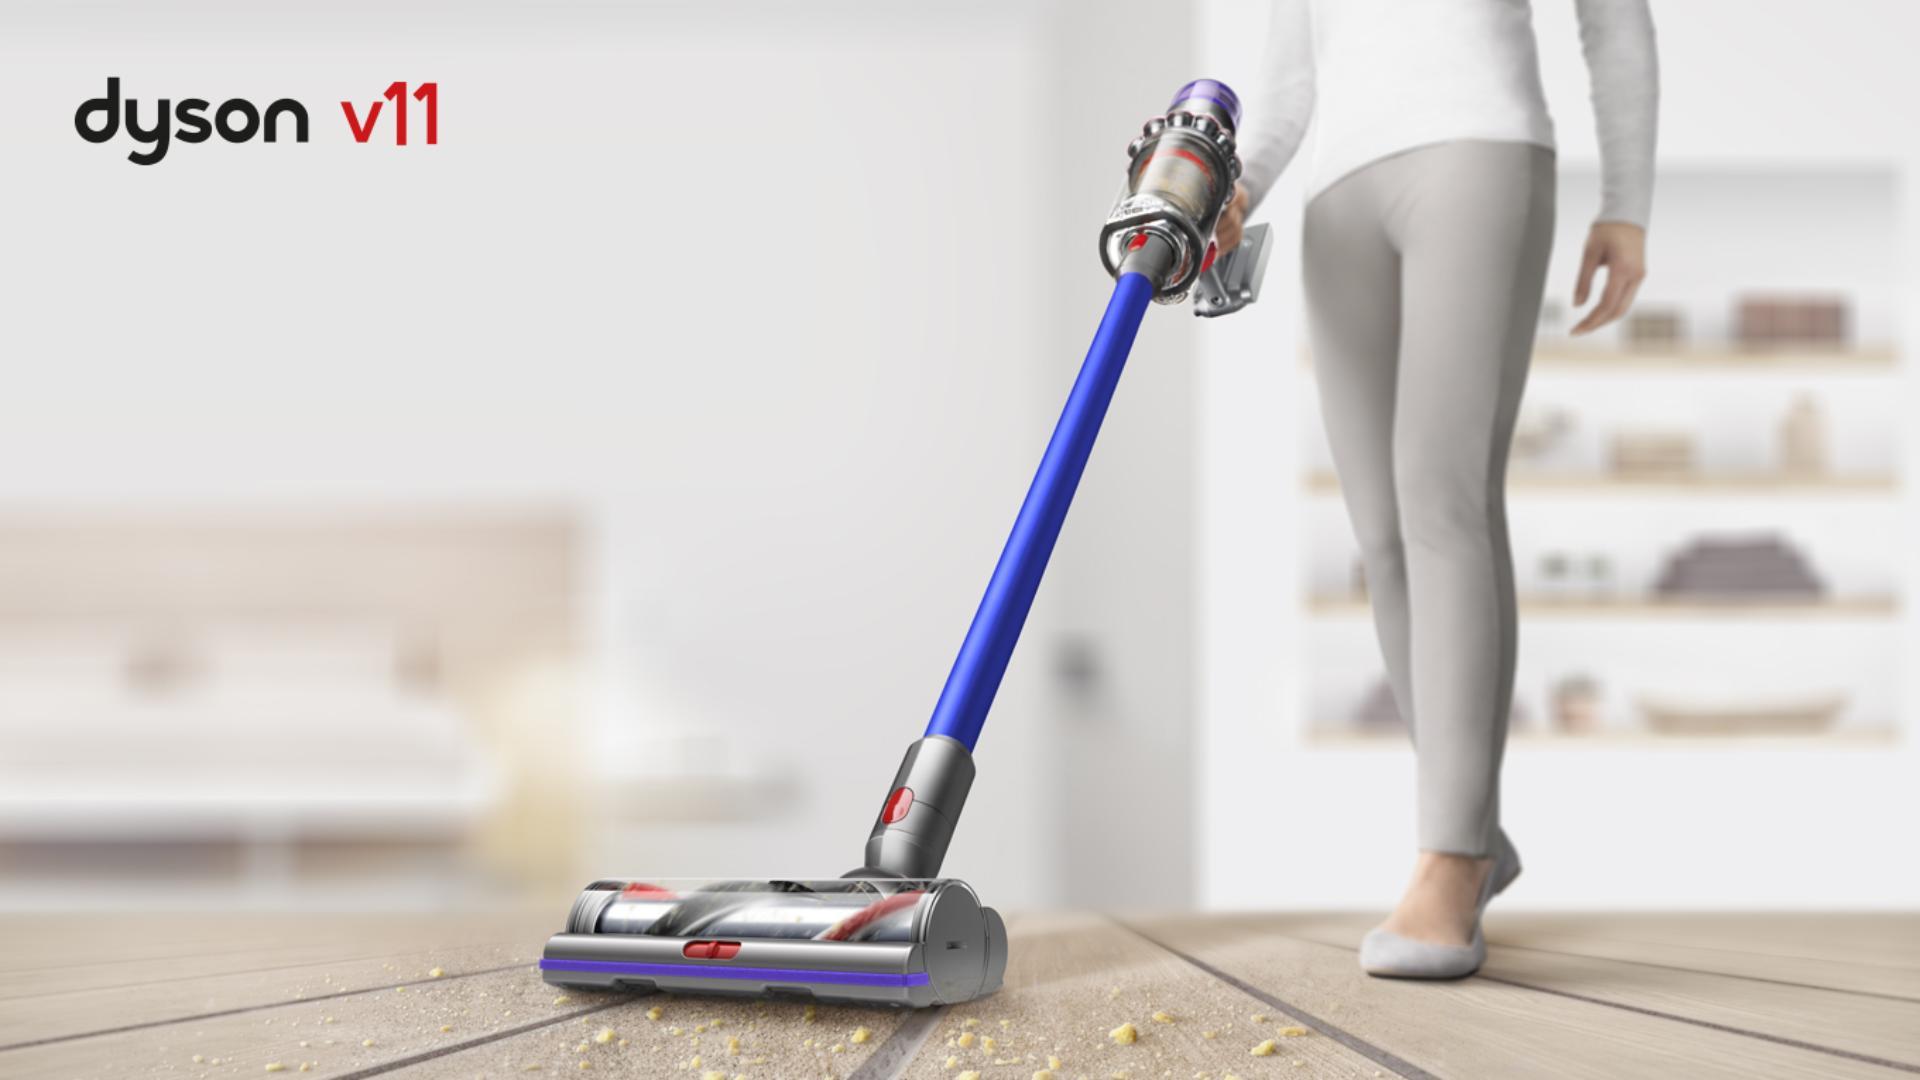 Dyson V11 Portable Cordless vacuum cleaner